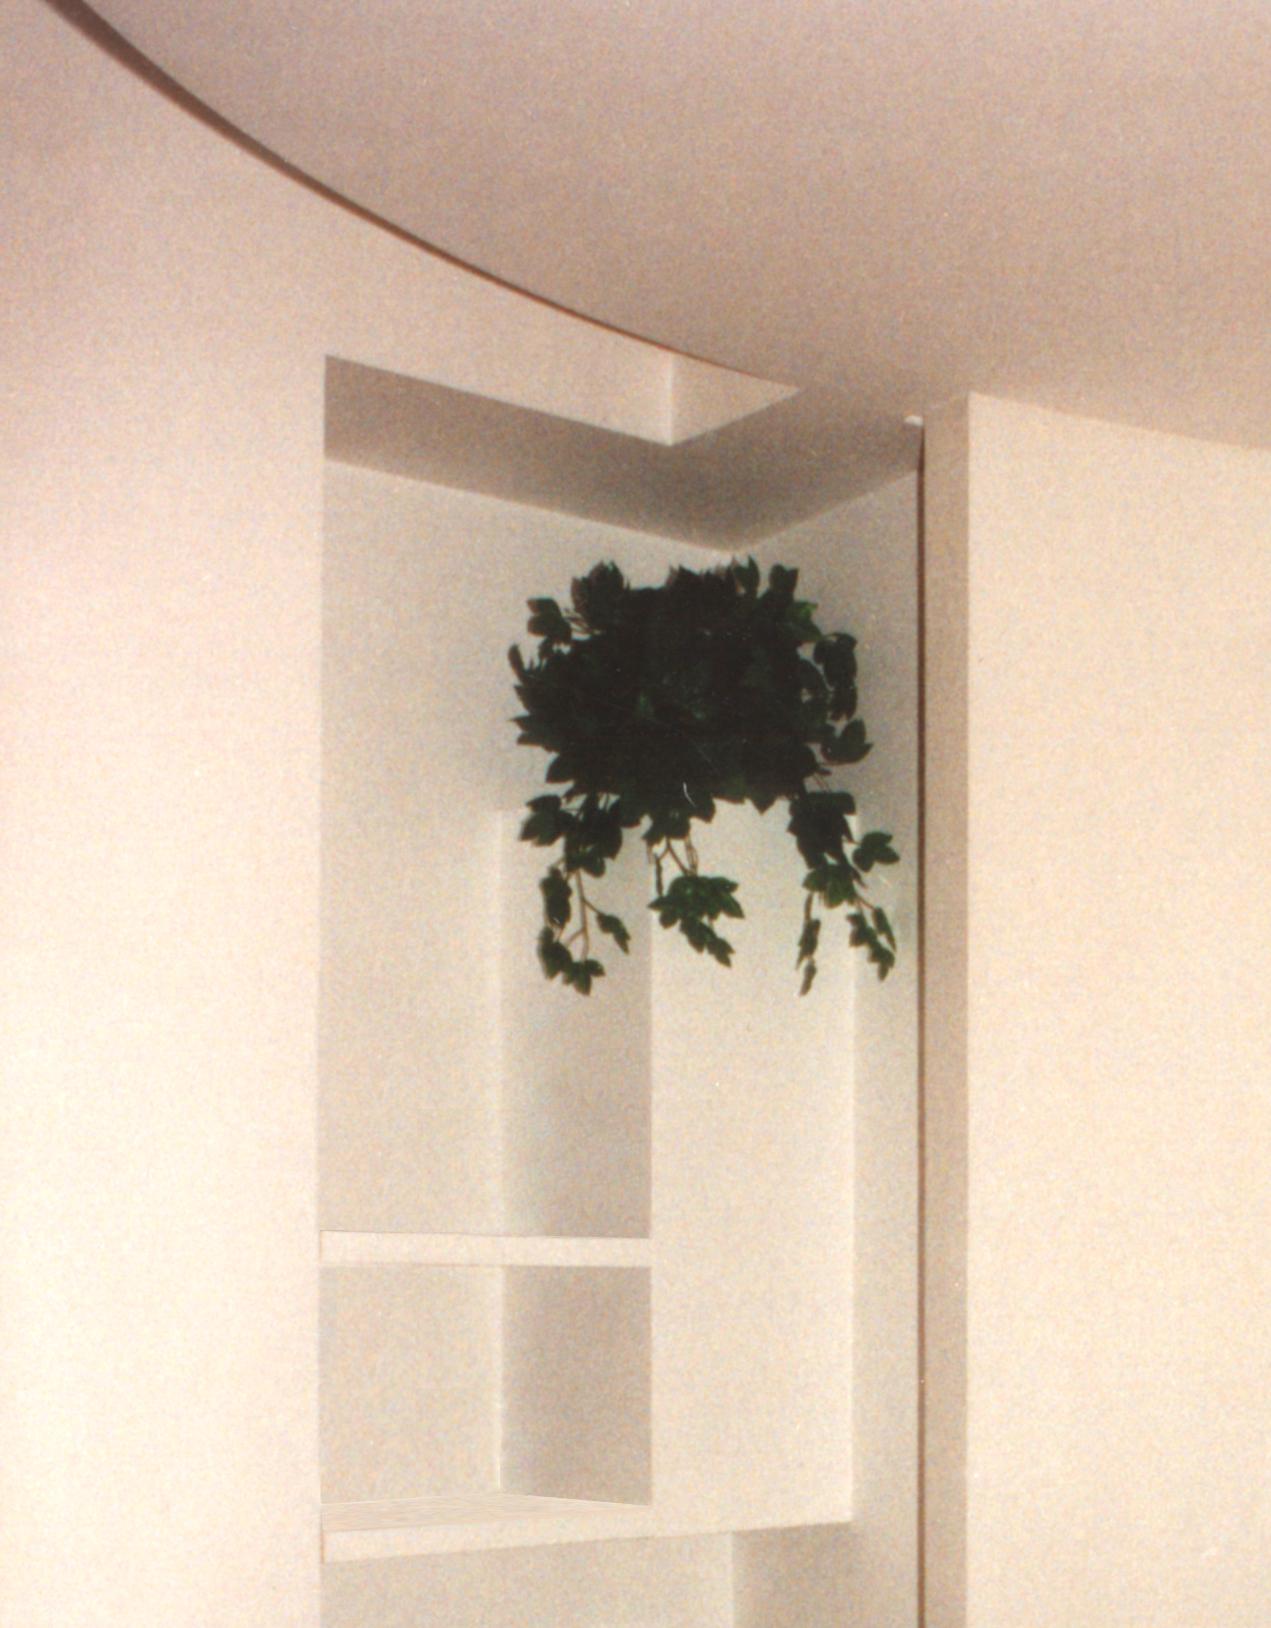 LEPETIT 1 .1989